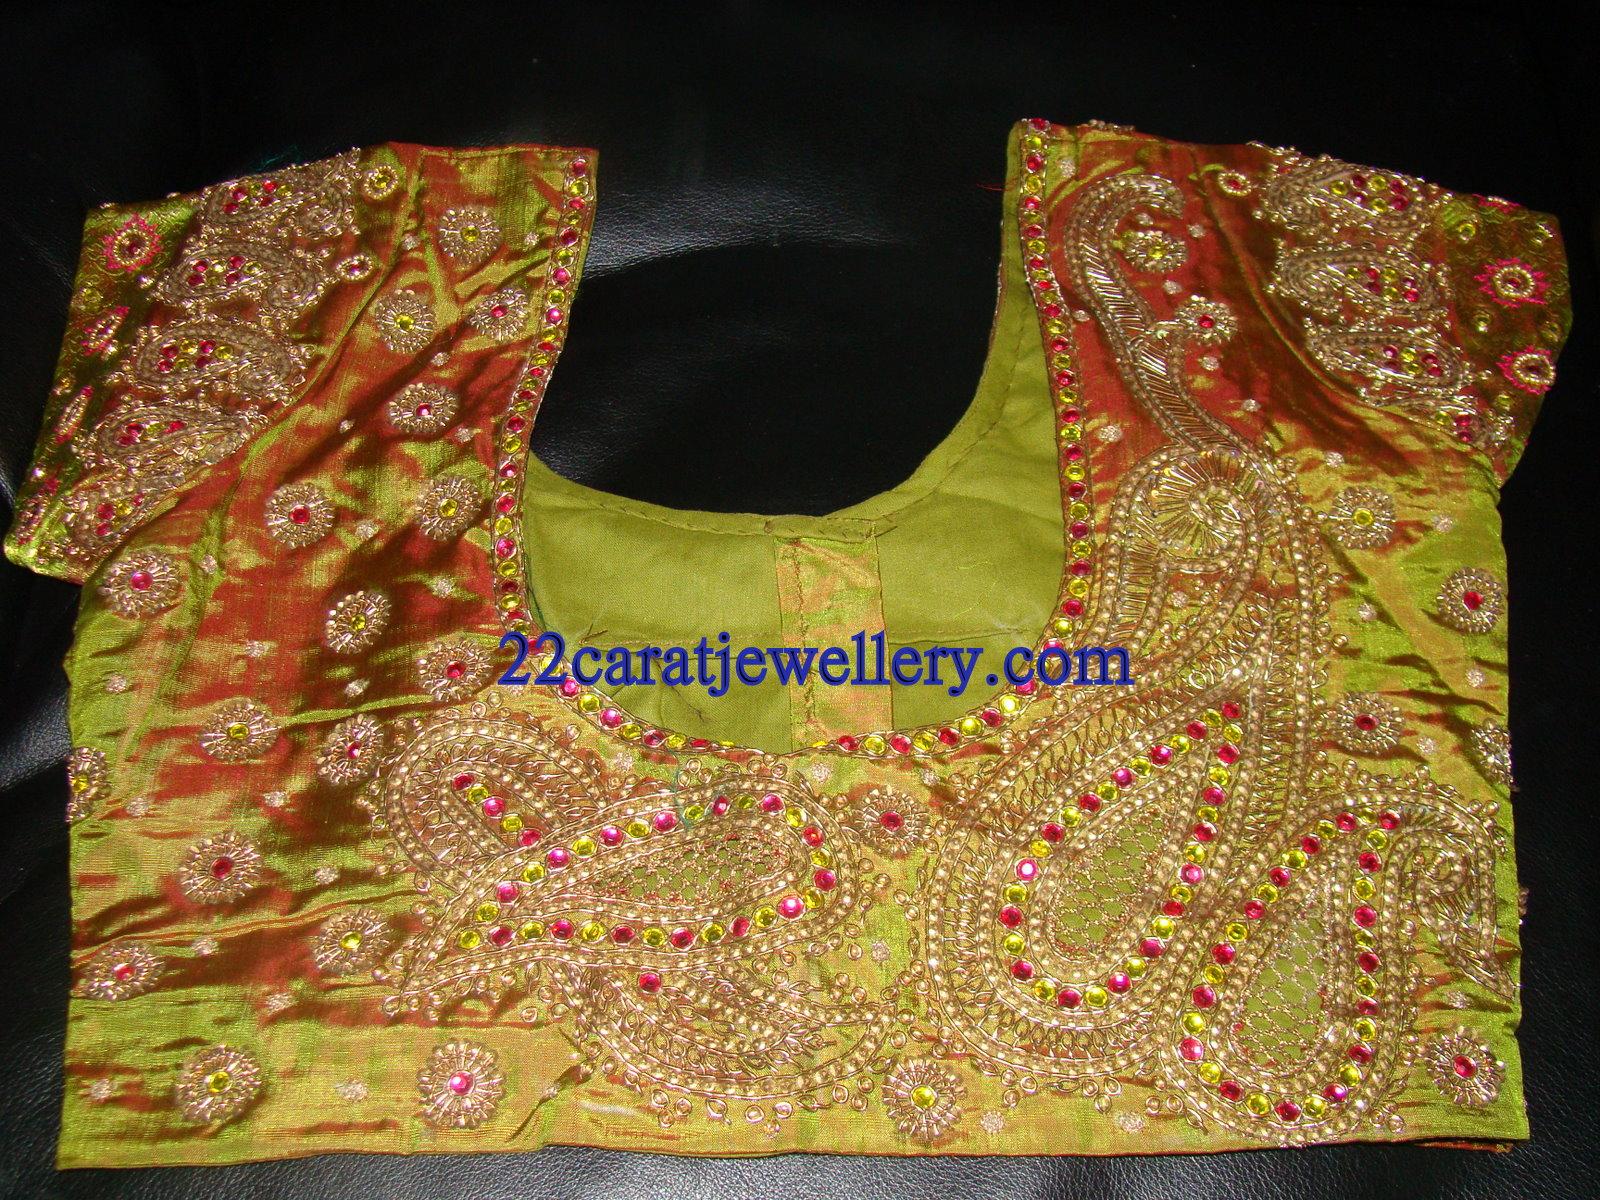 Designer Stone Kundan Beads Work Blouses For Wedding Sarees Saree Blouse Patterns